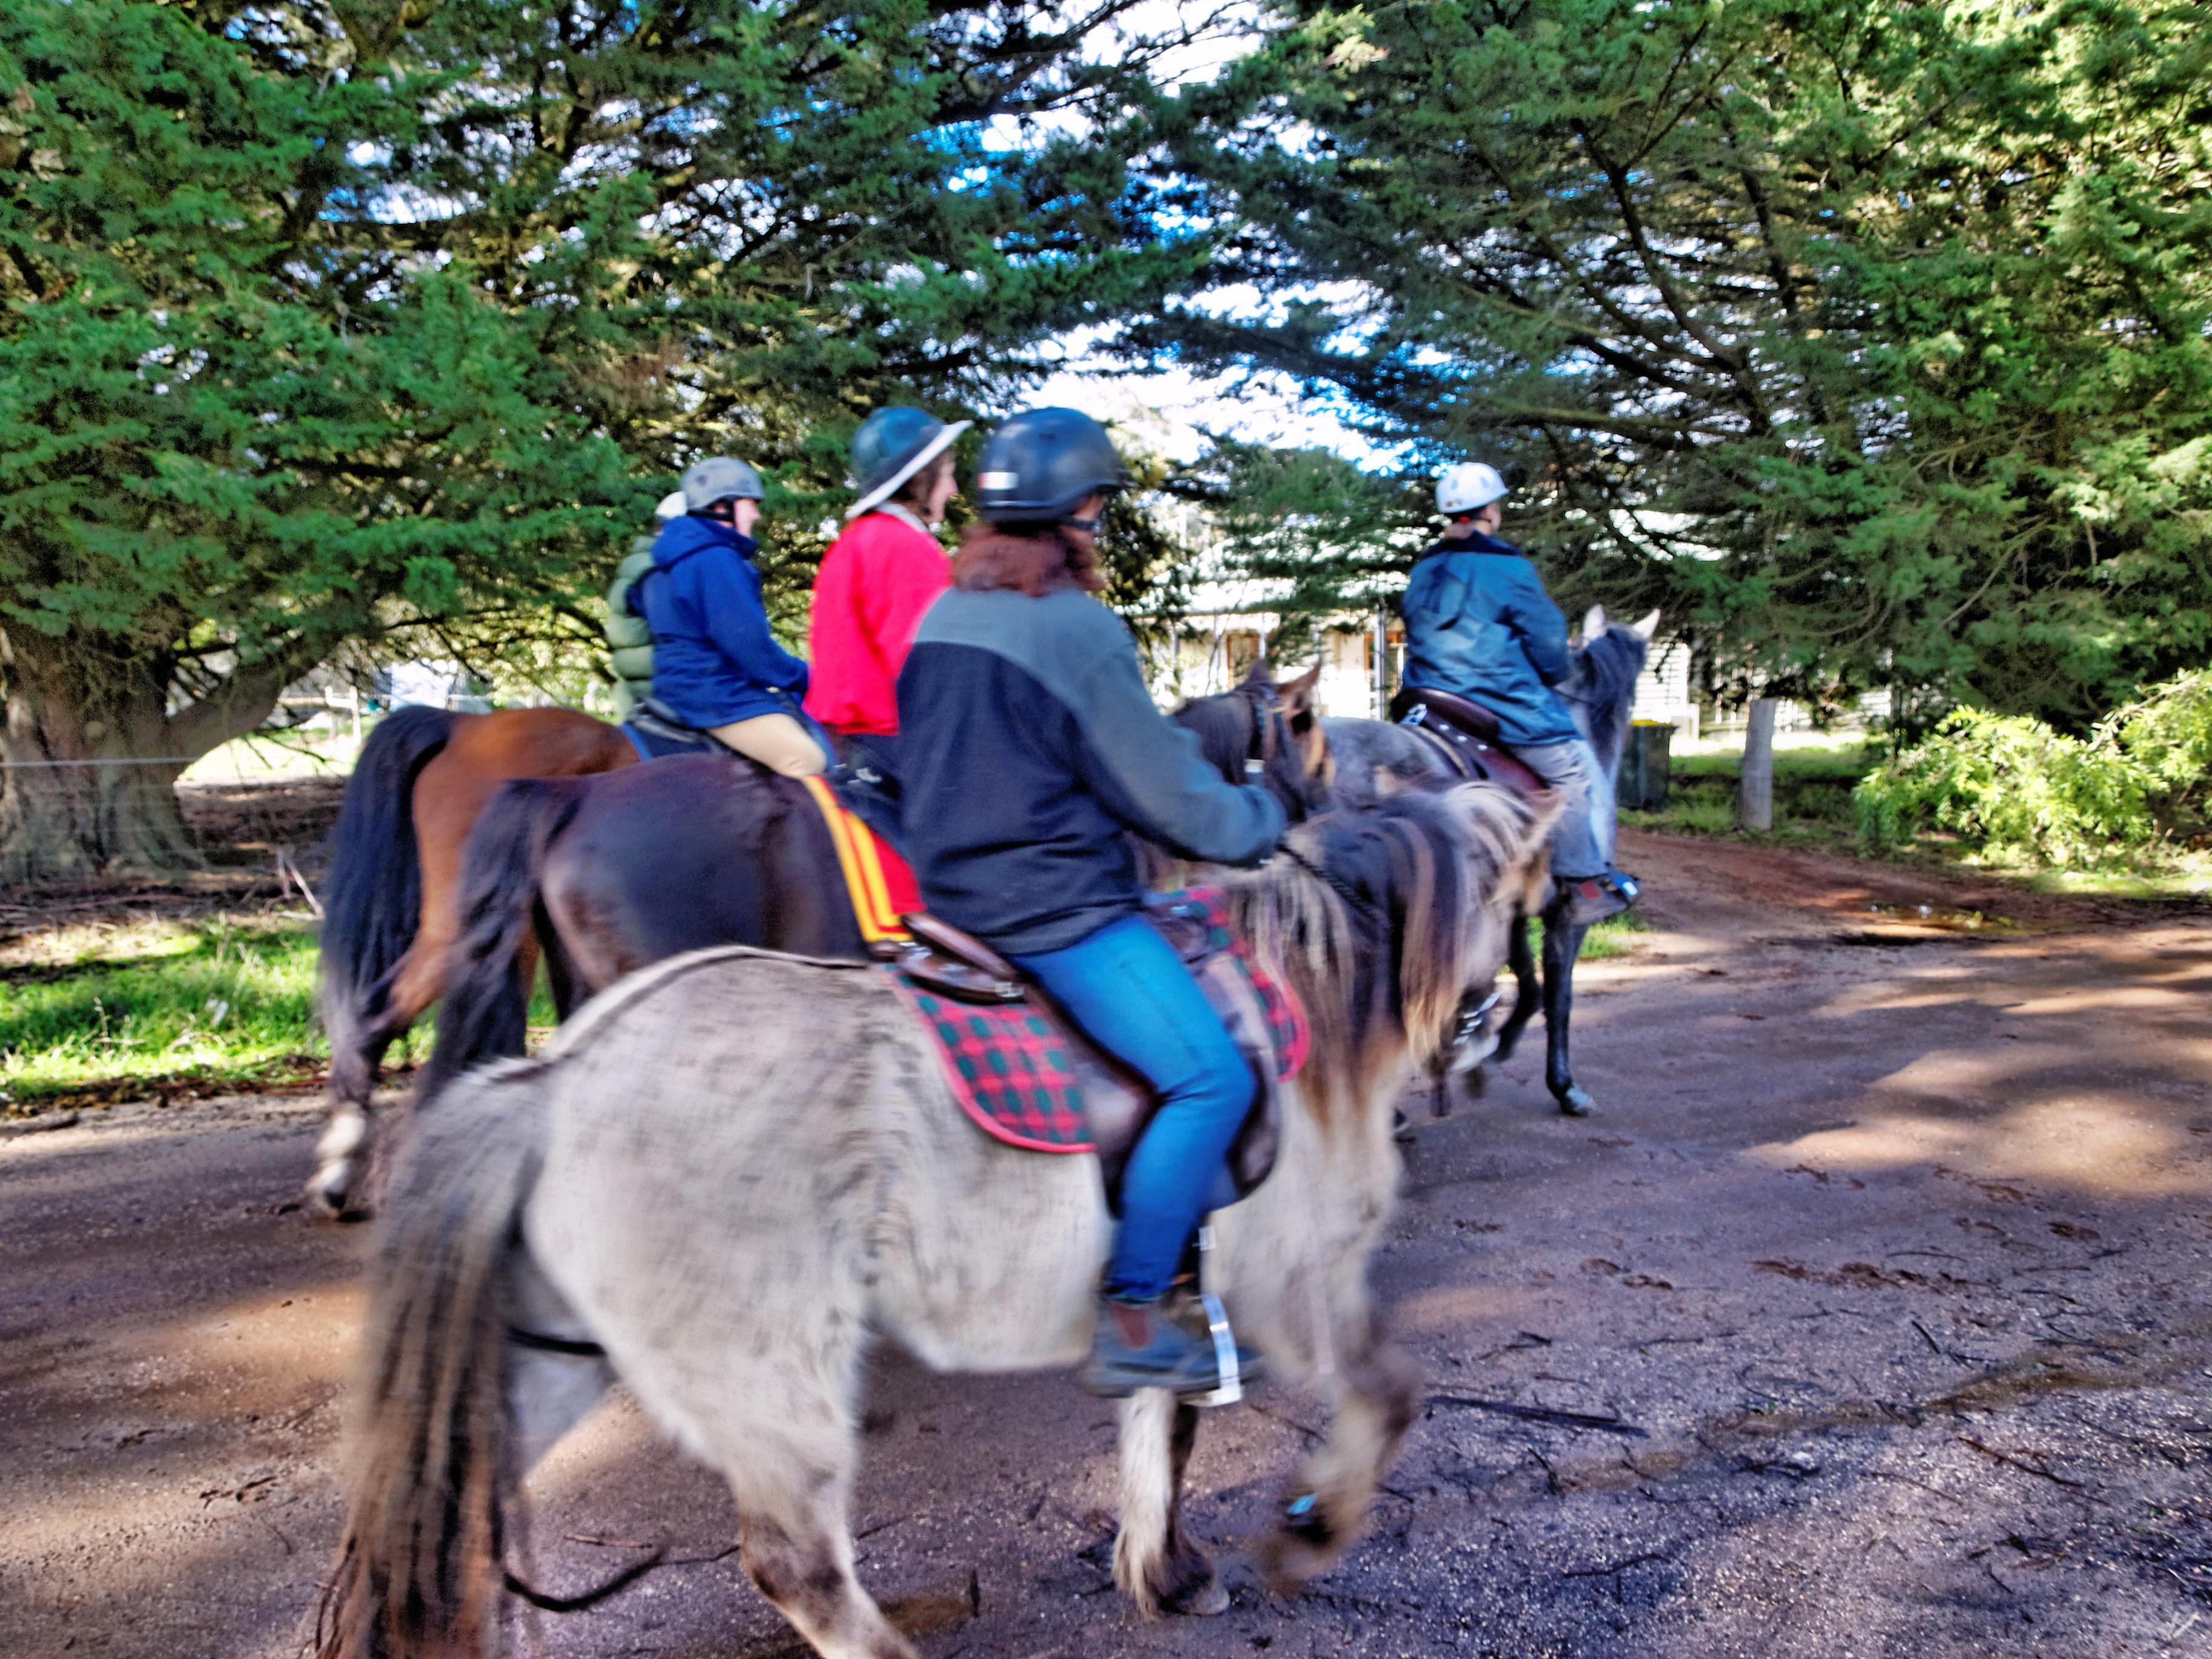 Horse-riding-16.jpeg